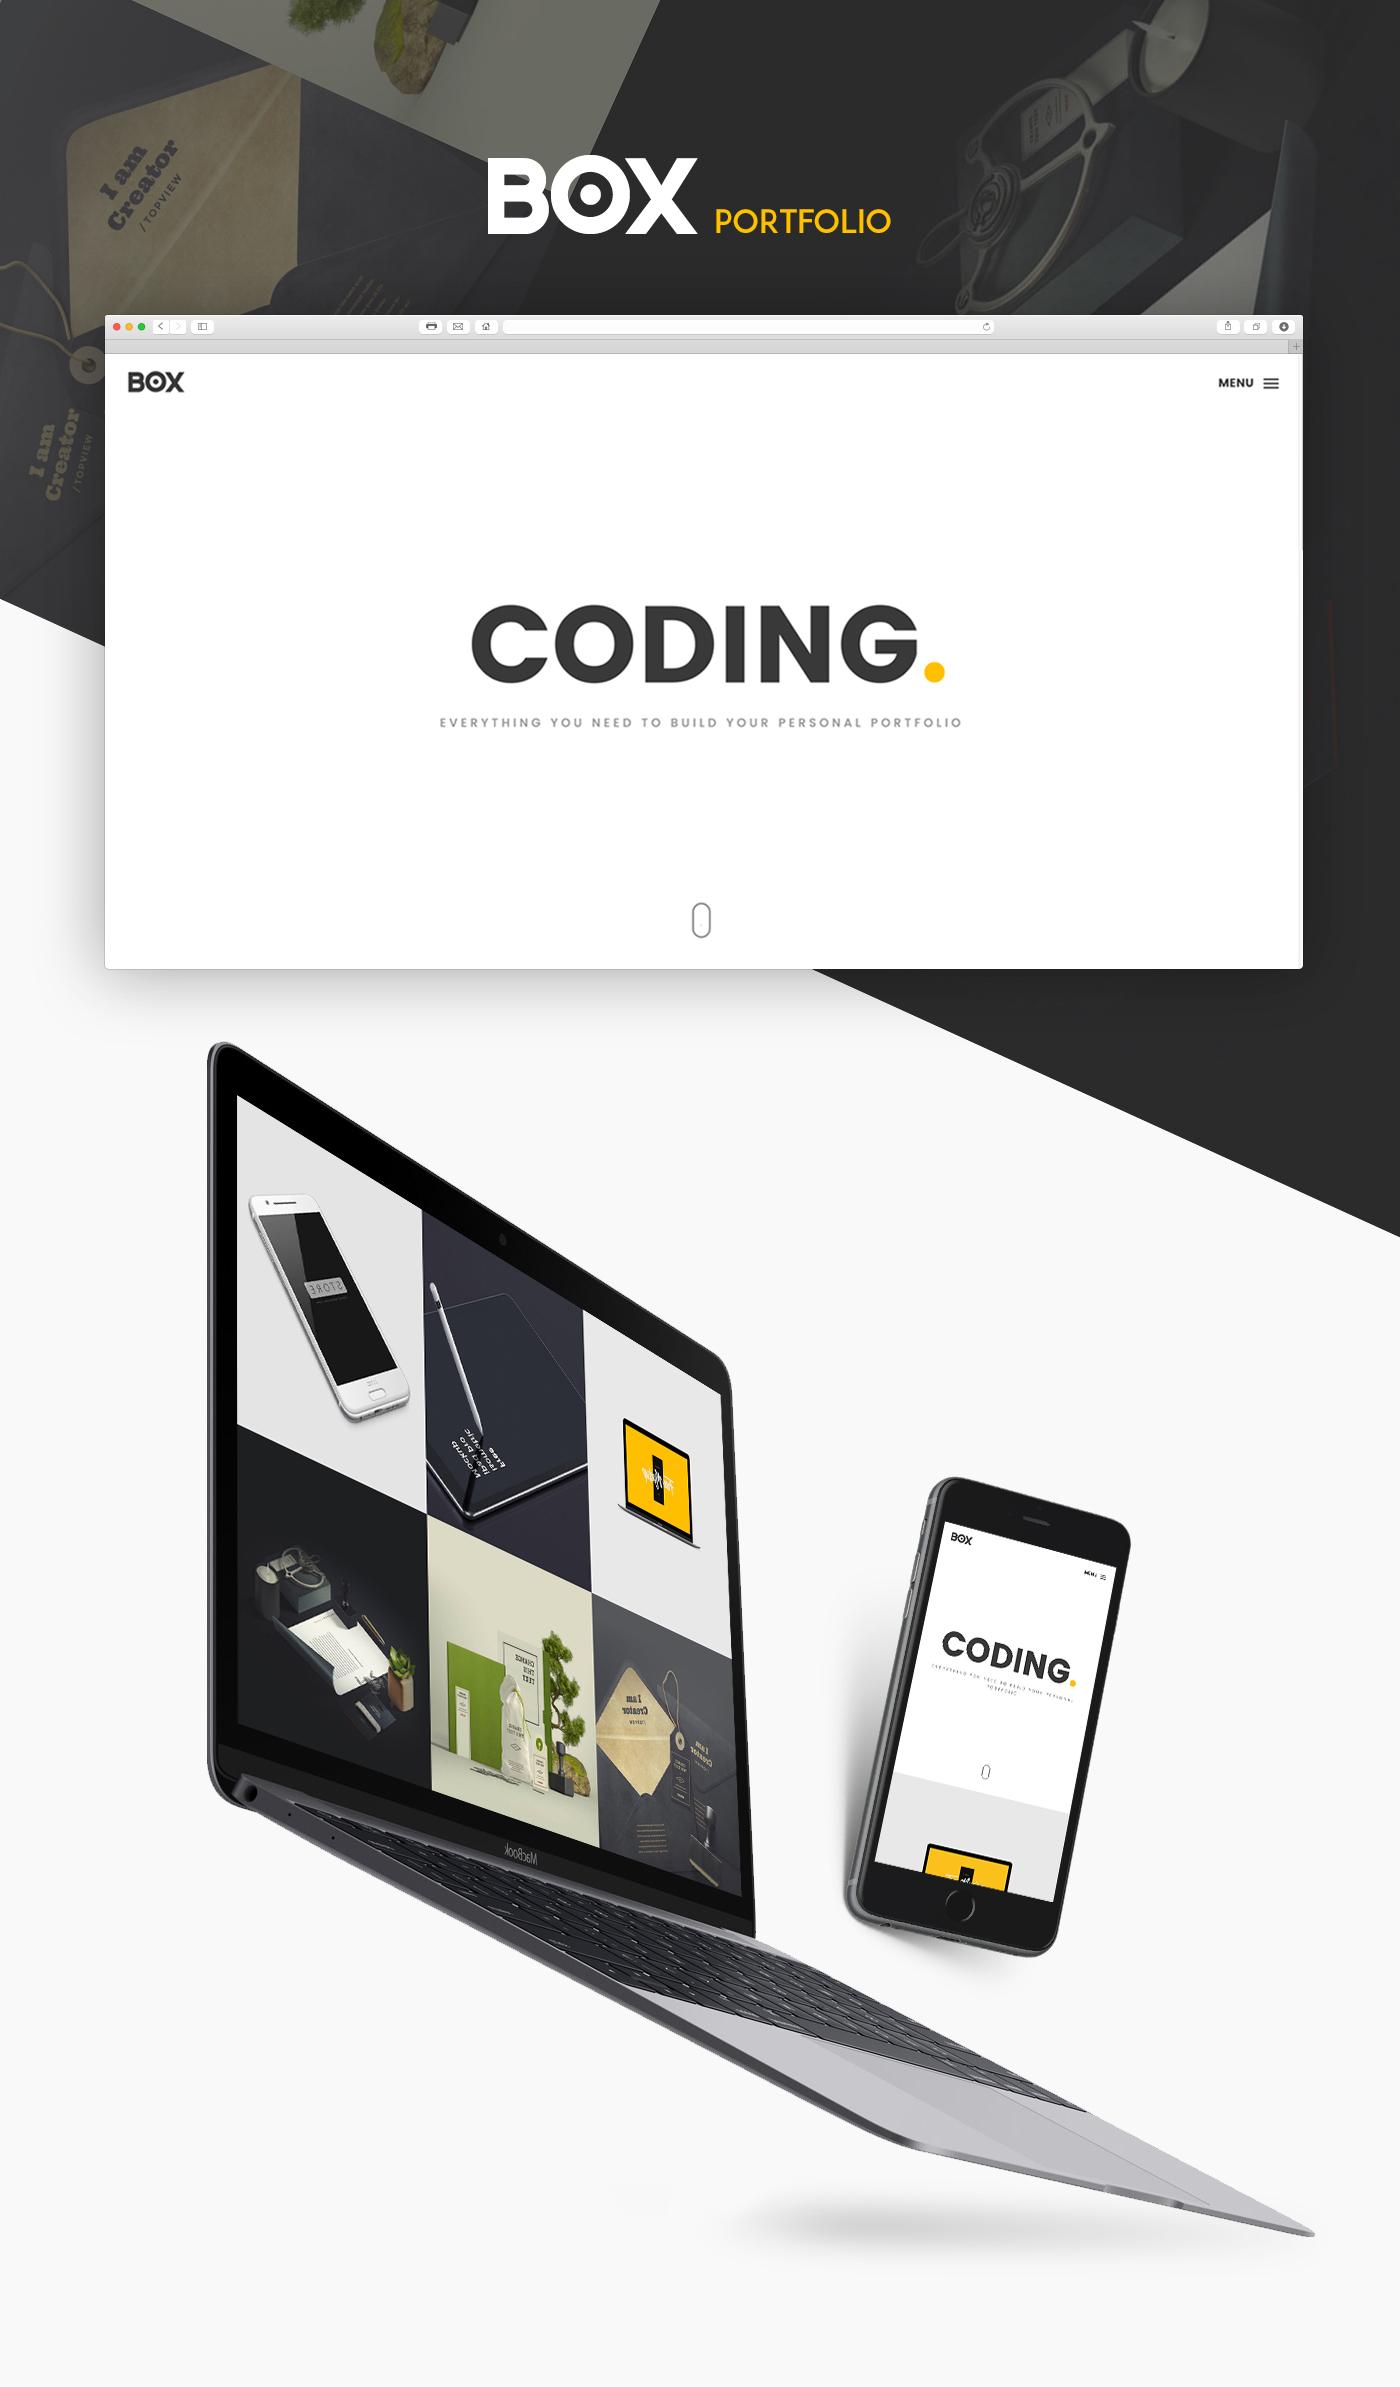 free,download,HTML,template,bootstrap,UI,ux,design,Webdesign,Web,portfolio,modern,clean,freebie,freebies